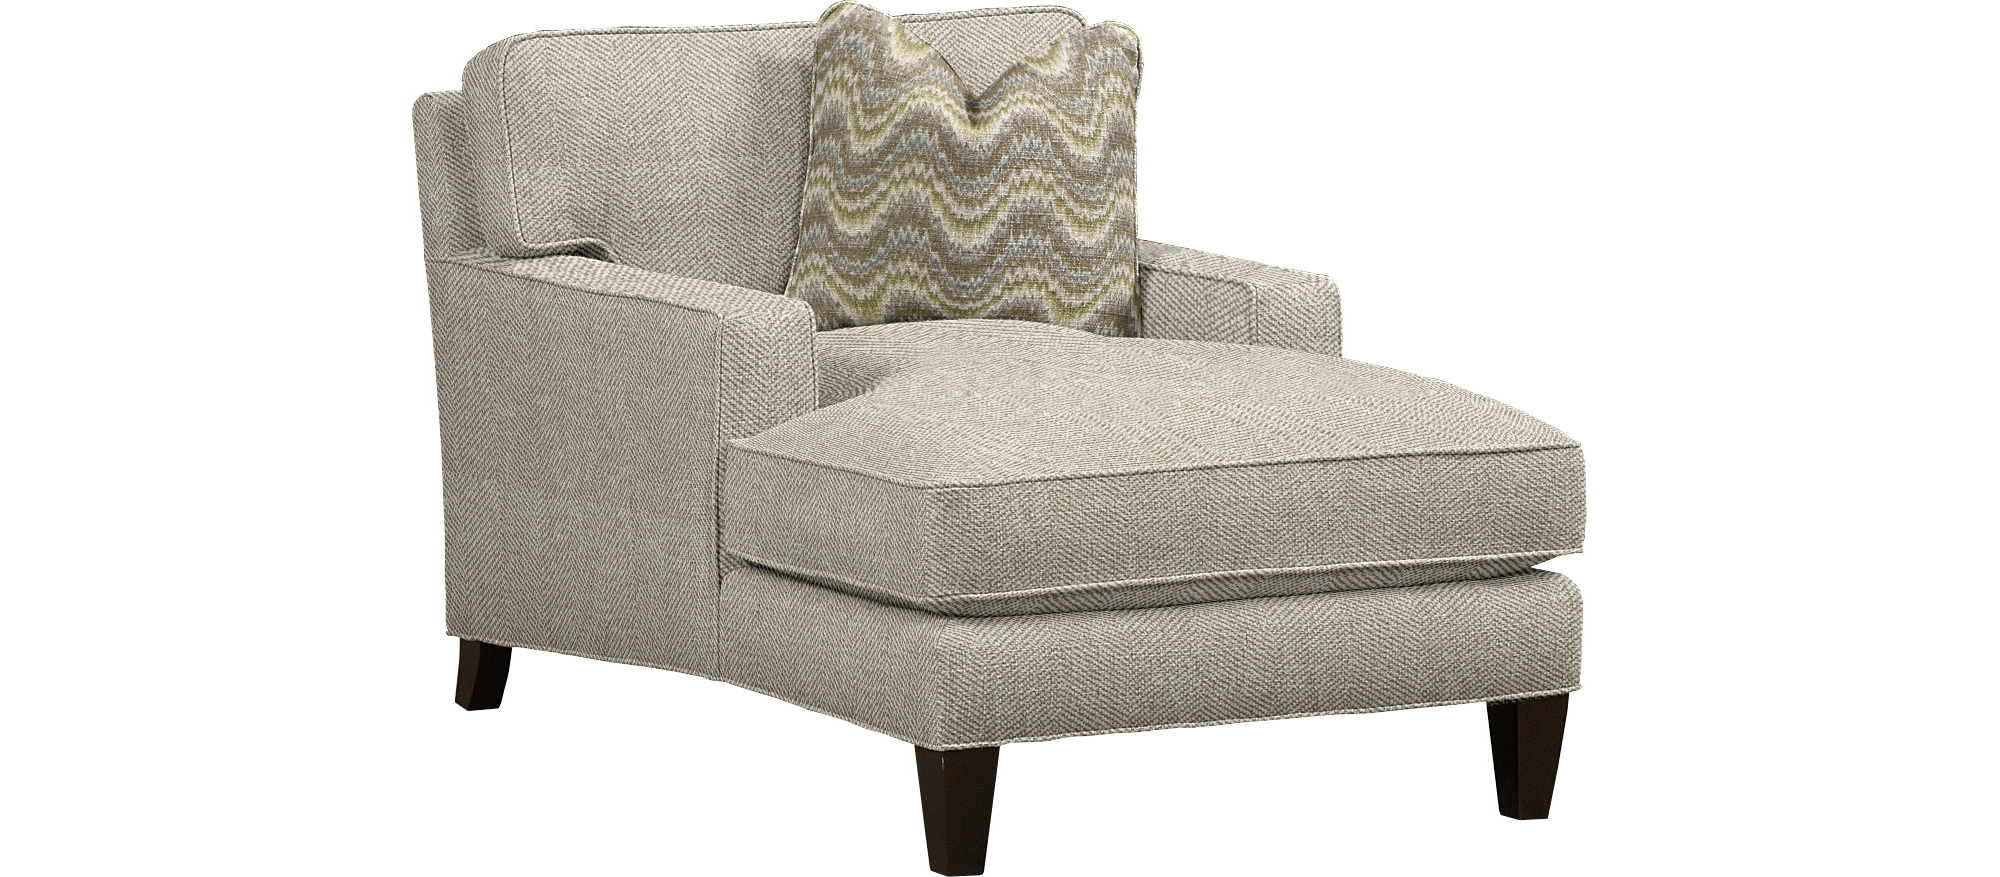 Main katy chaise image